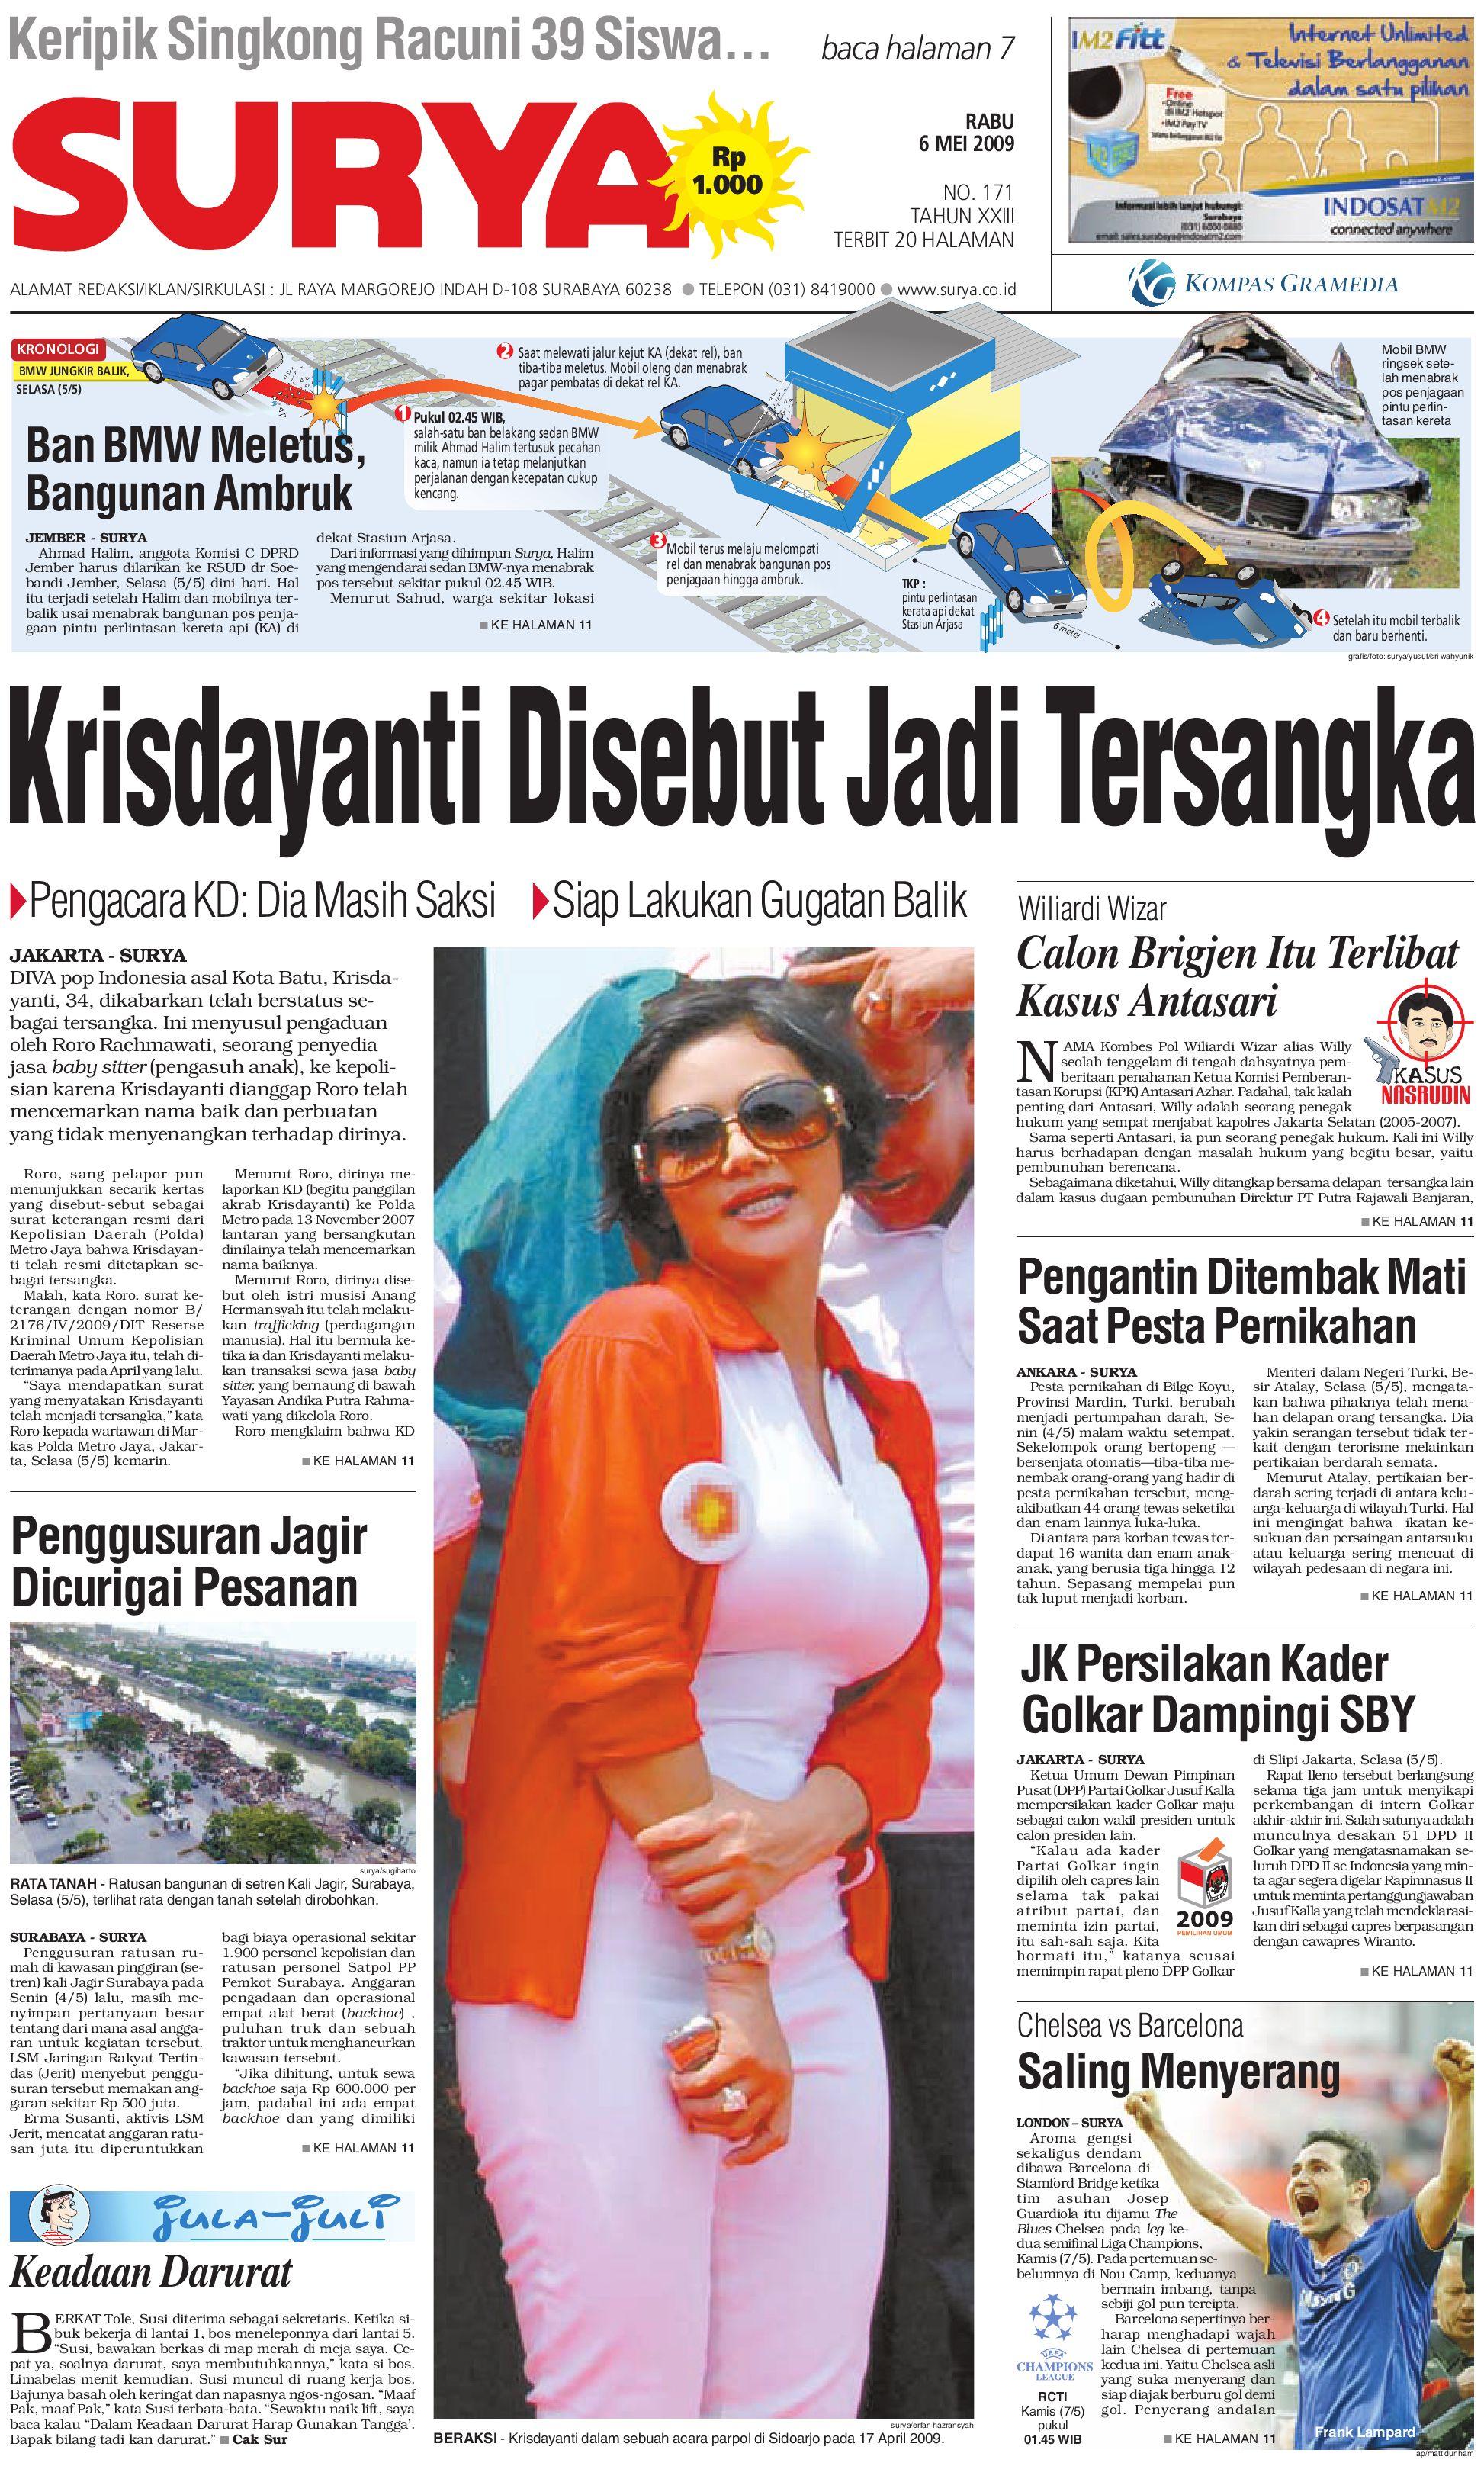 Surya Edisi Cetak 06 Mei 2009 By Harian Issuu Rkb Tegal Madu Mongso